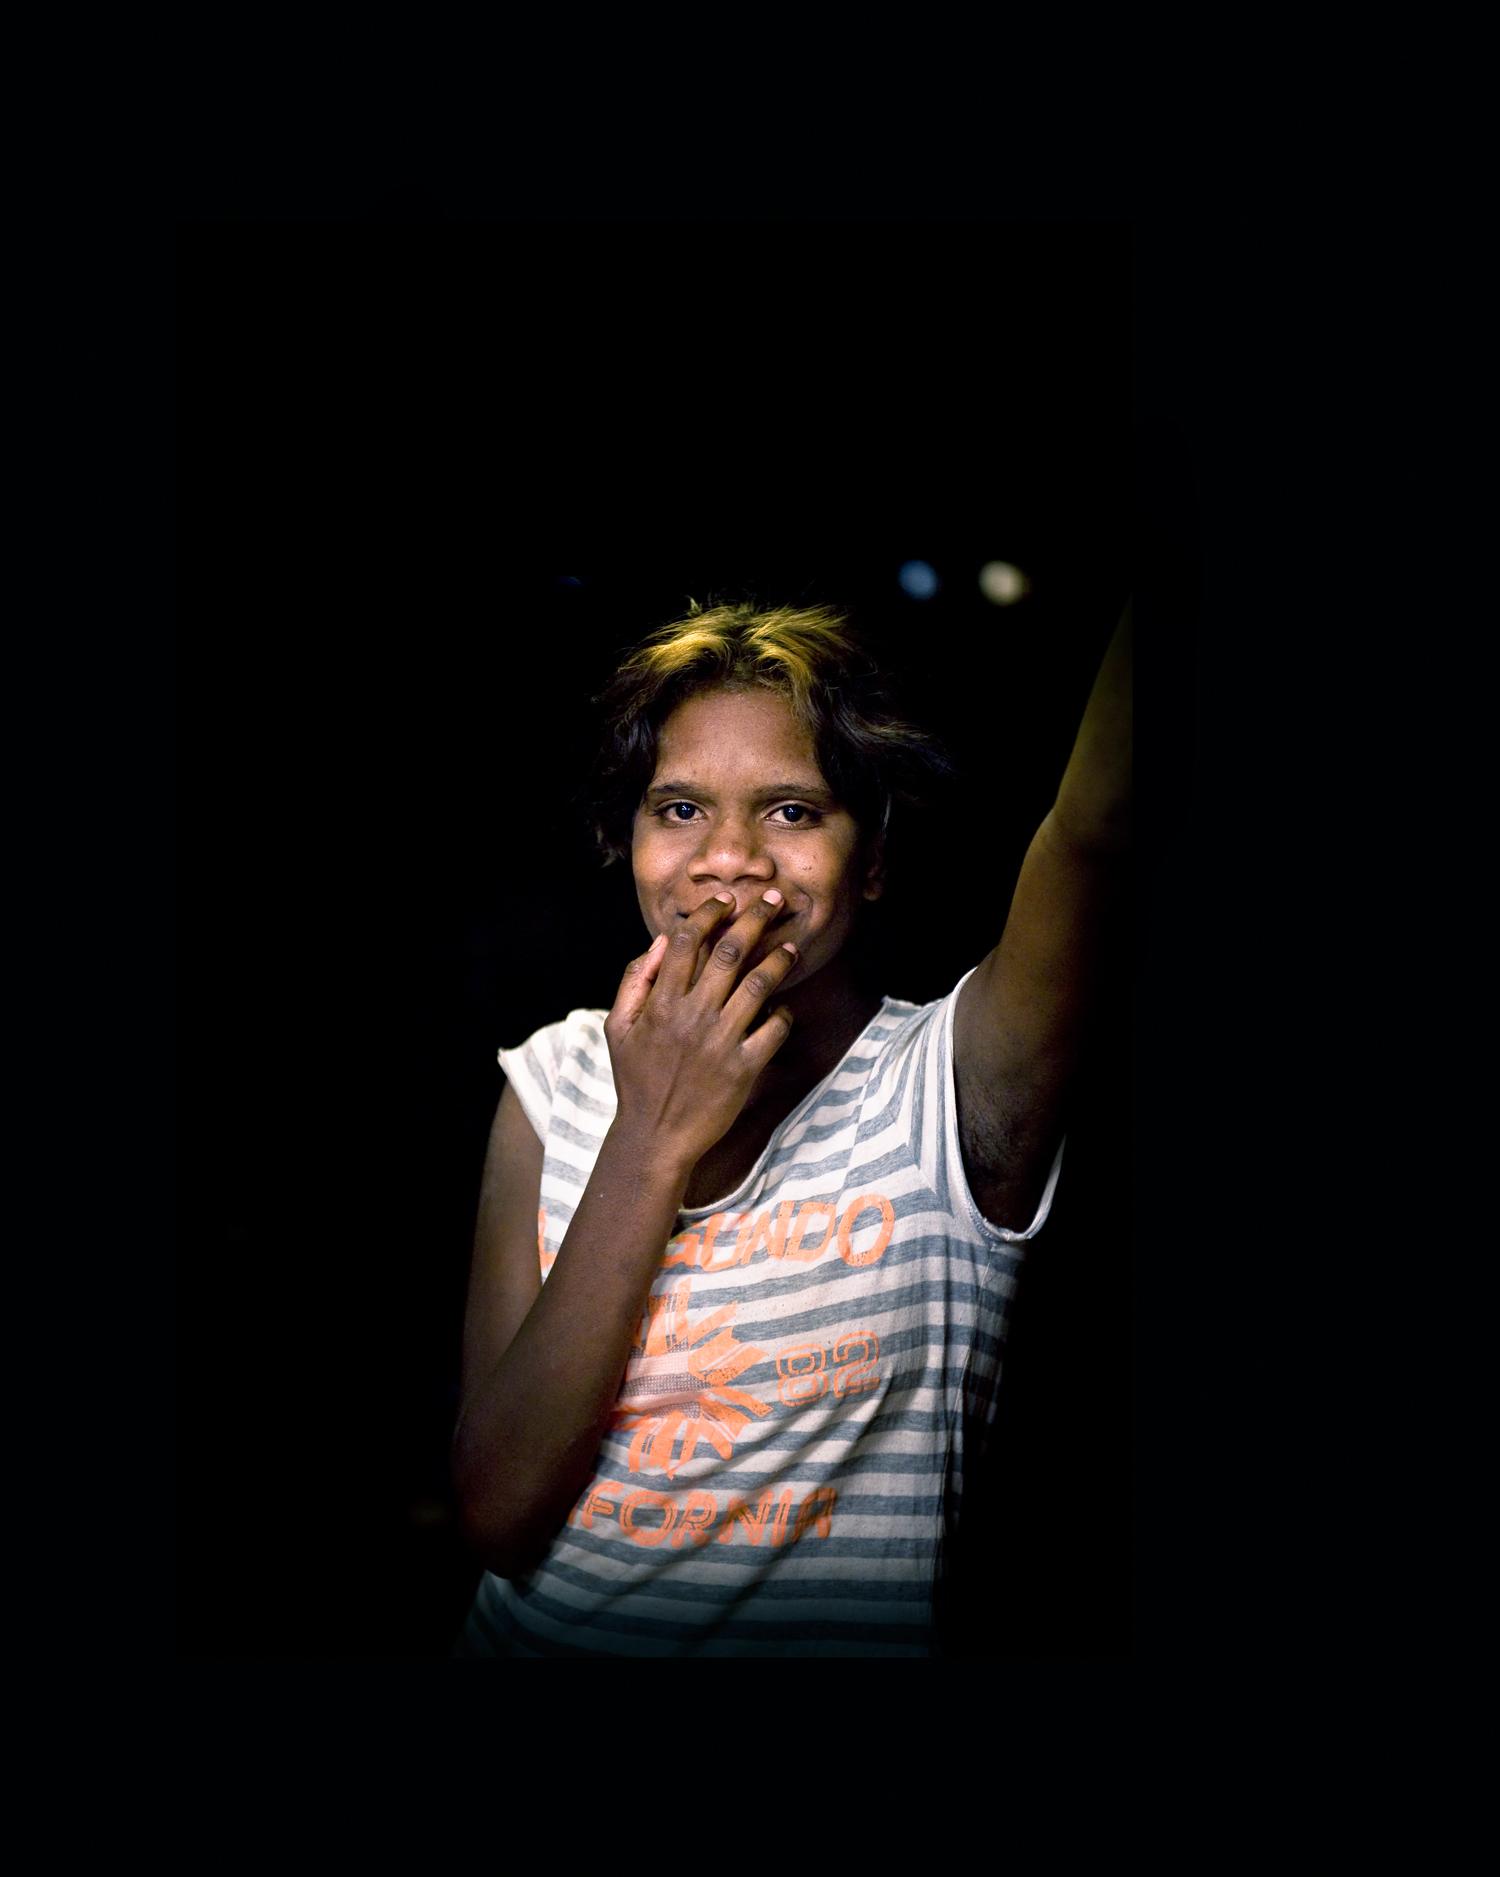 'Nyirripi Girl With Smile'